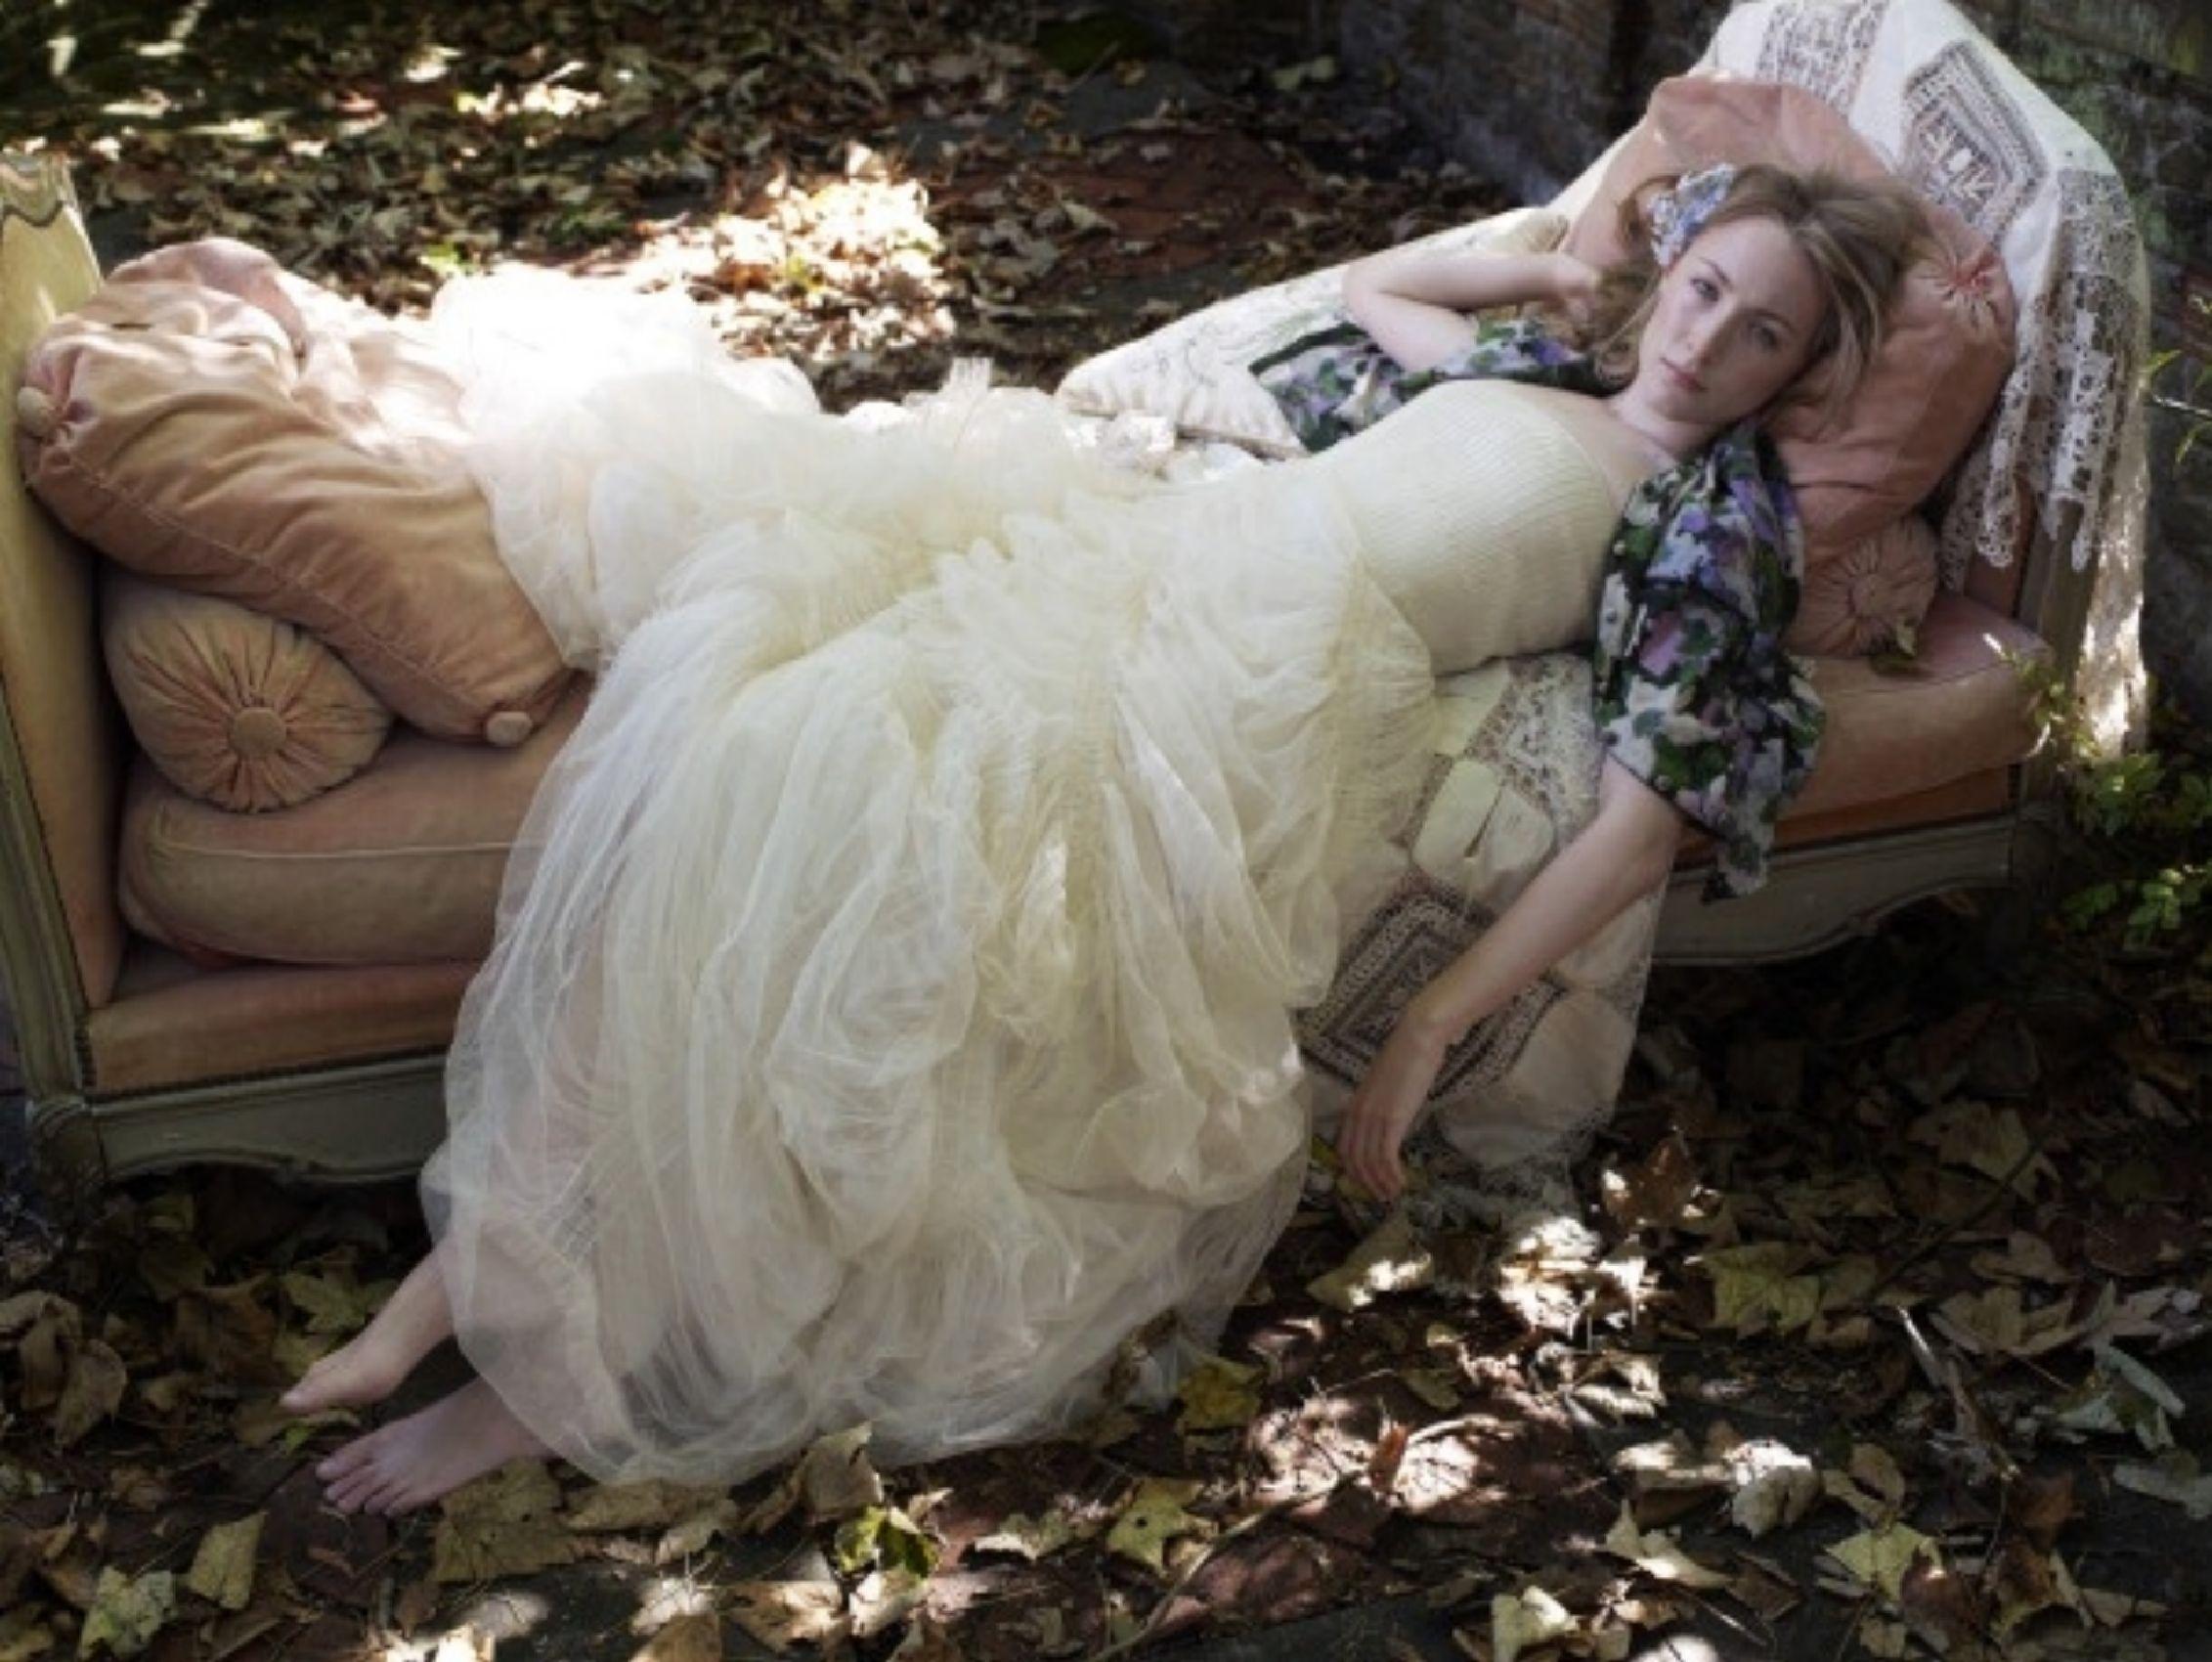 https://pics.wikifeet.com/Saoirse-Ronan-Feet-545135.jpg